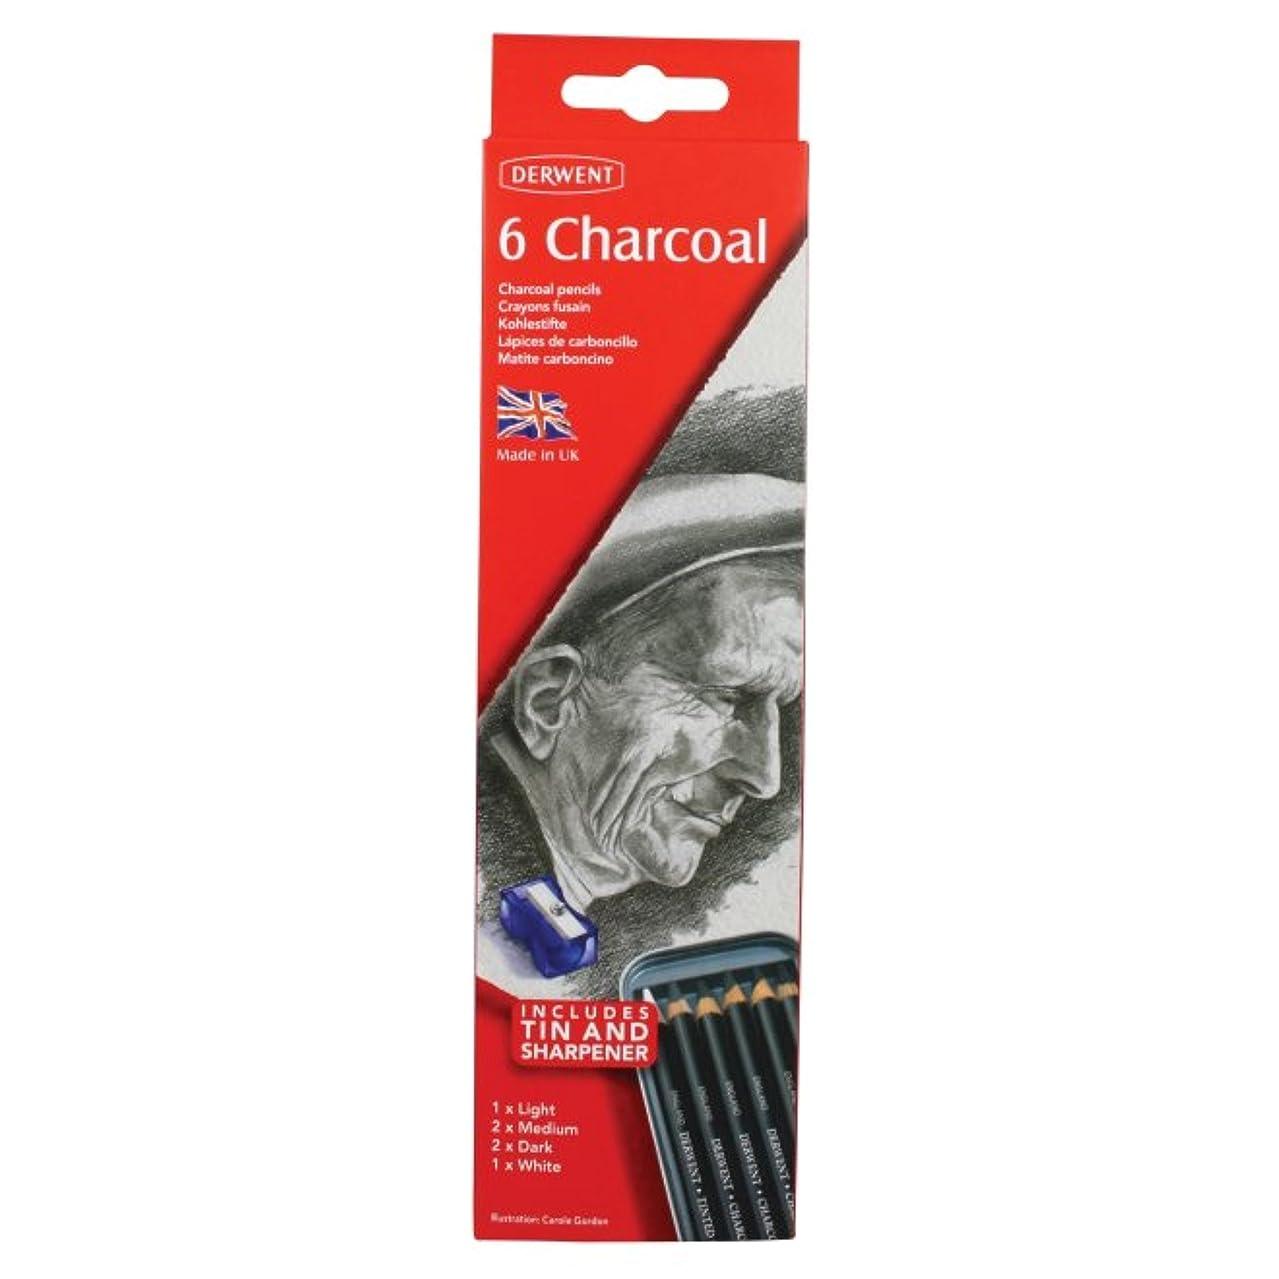 Derwent Charcoal Pencils, Metal Tin, 6 Count (0700838)